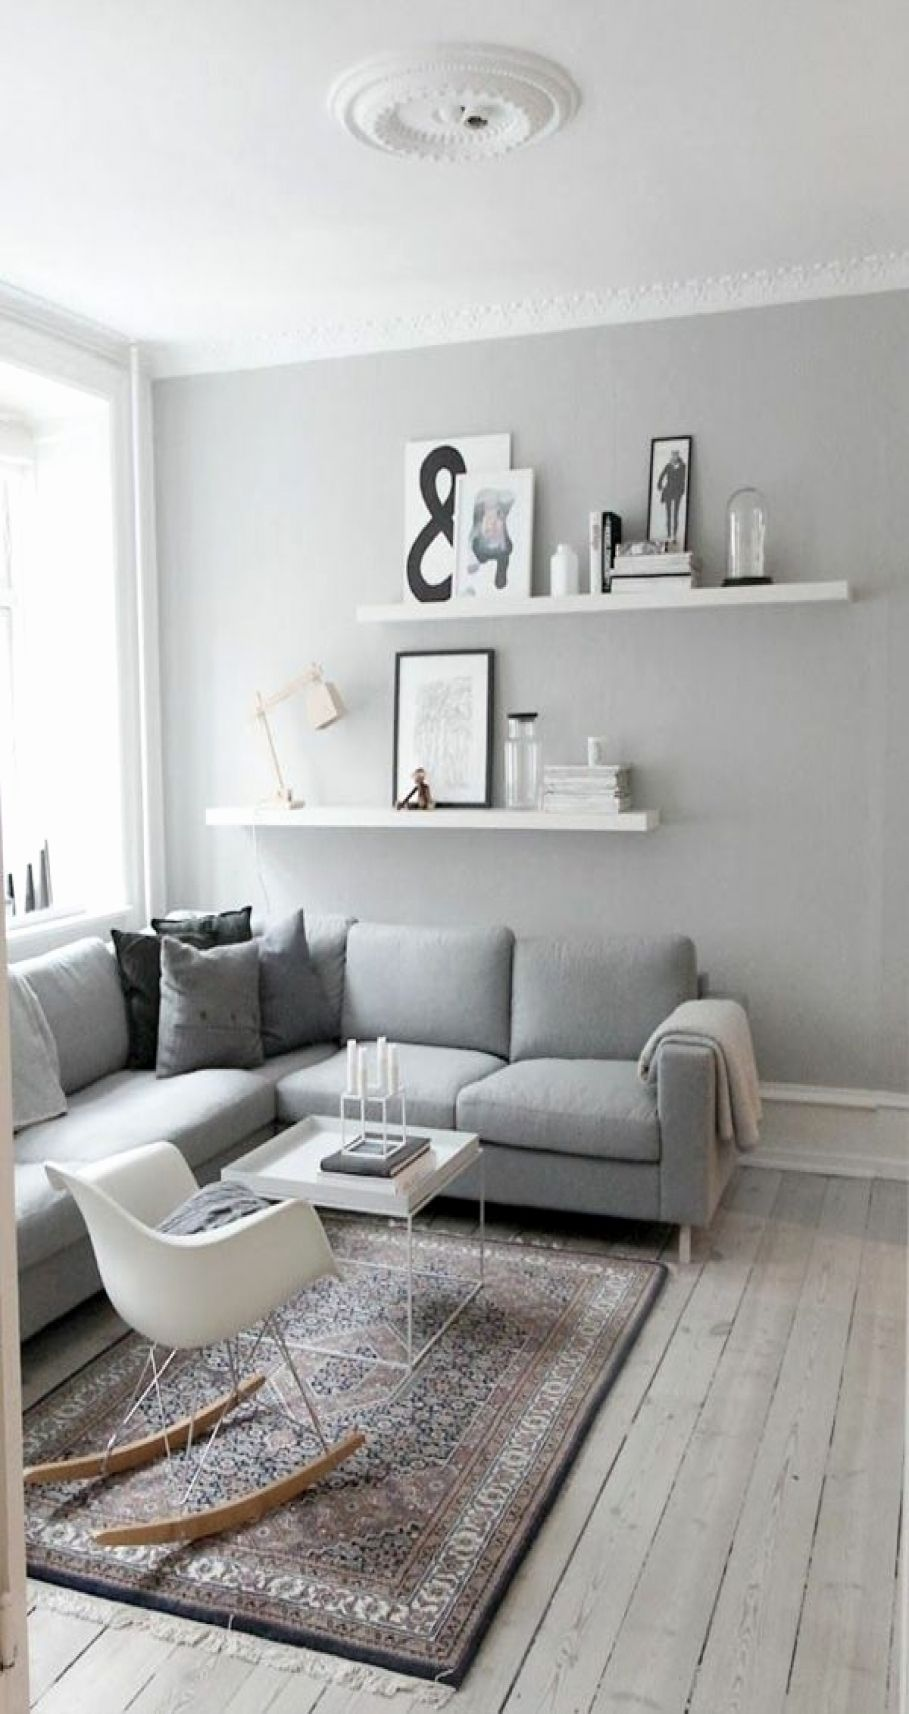 Graue Wandfarbe Wohnzimmer Fancy Graue Wand Wohnzimmer Graue Wand Wohnzimmer In 2020 Apartment Living Room